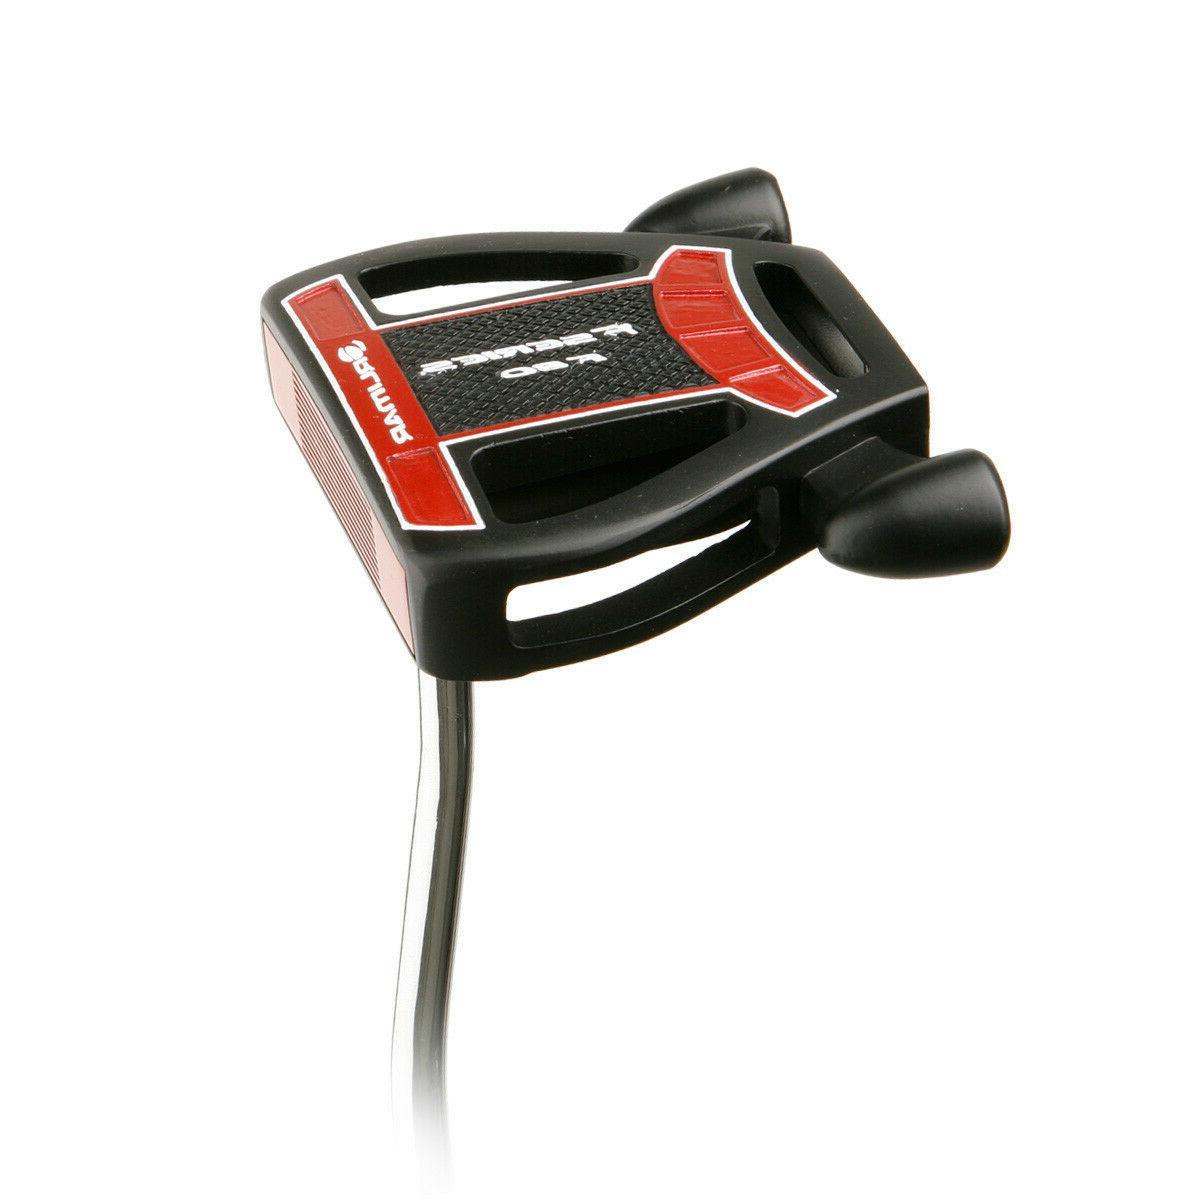 golf f80 mallet putter 35 right handed